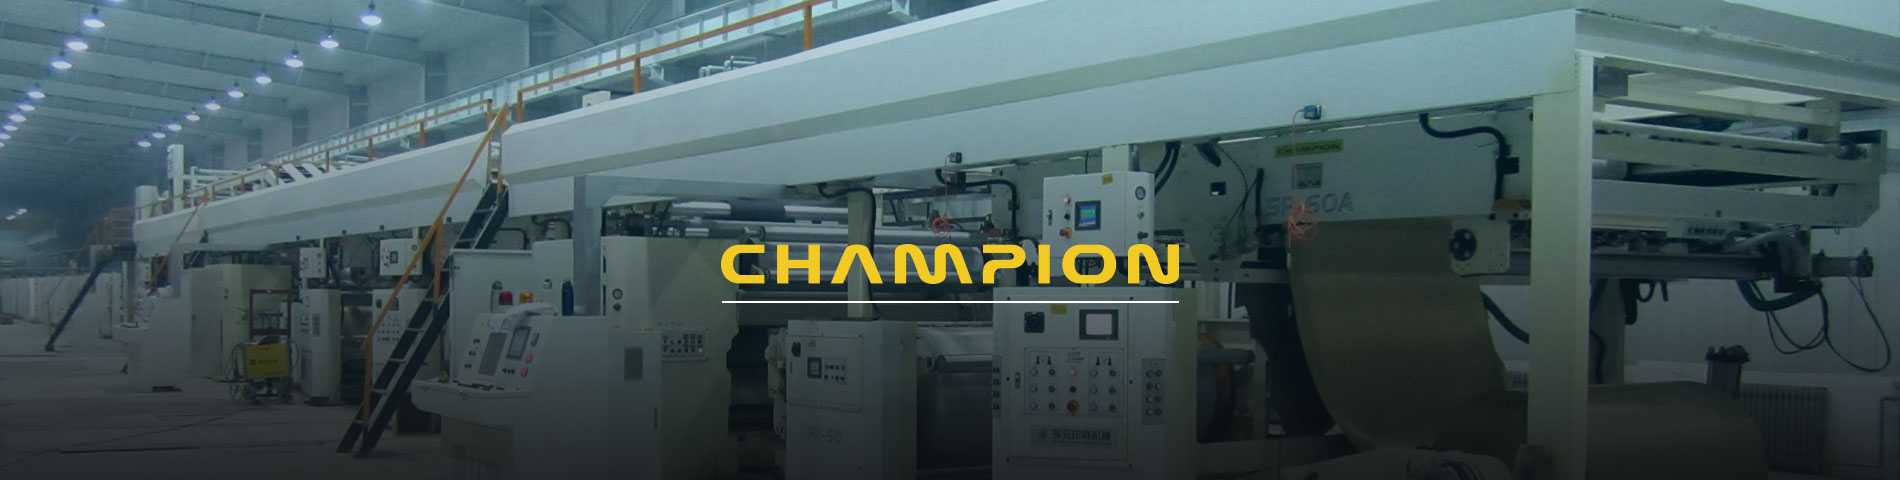 Champion Corrugated is a Professional Corrugated Cardboard Equipment Manufacturer